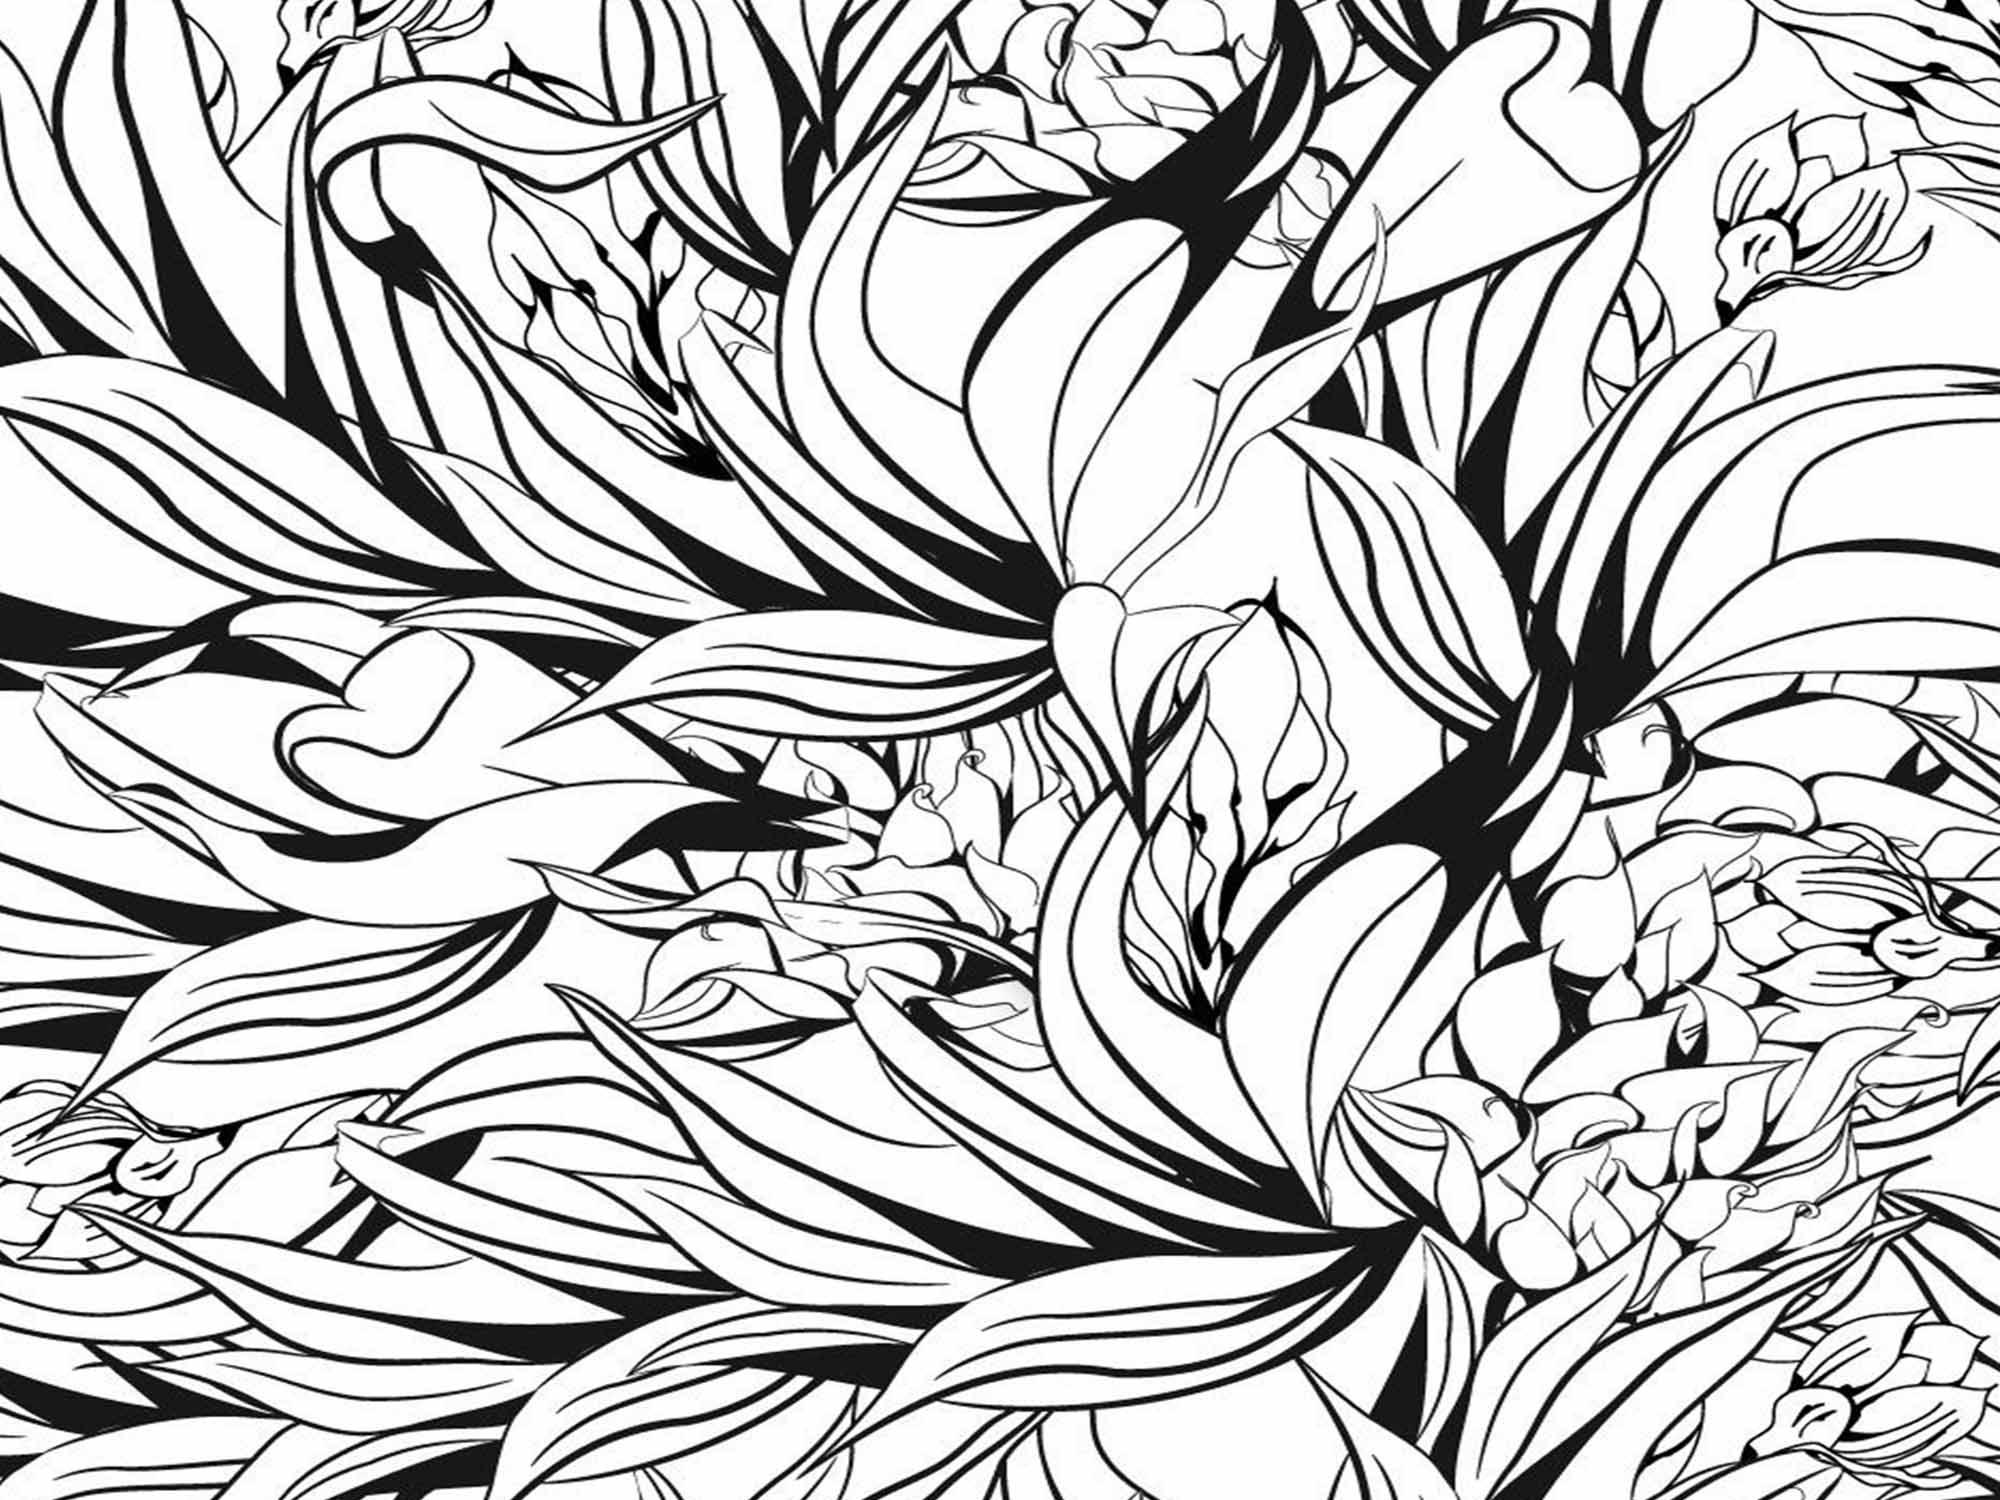 Papel de Parede Floral 0028 - Adesivos de Parede  - Paredes Decoradas